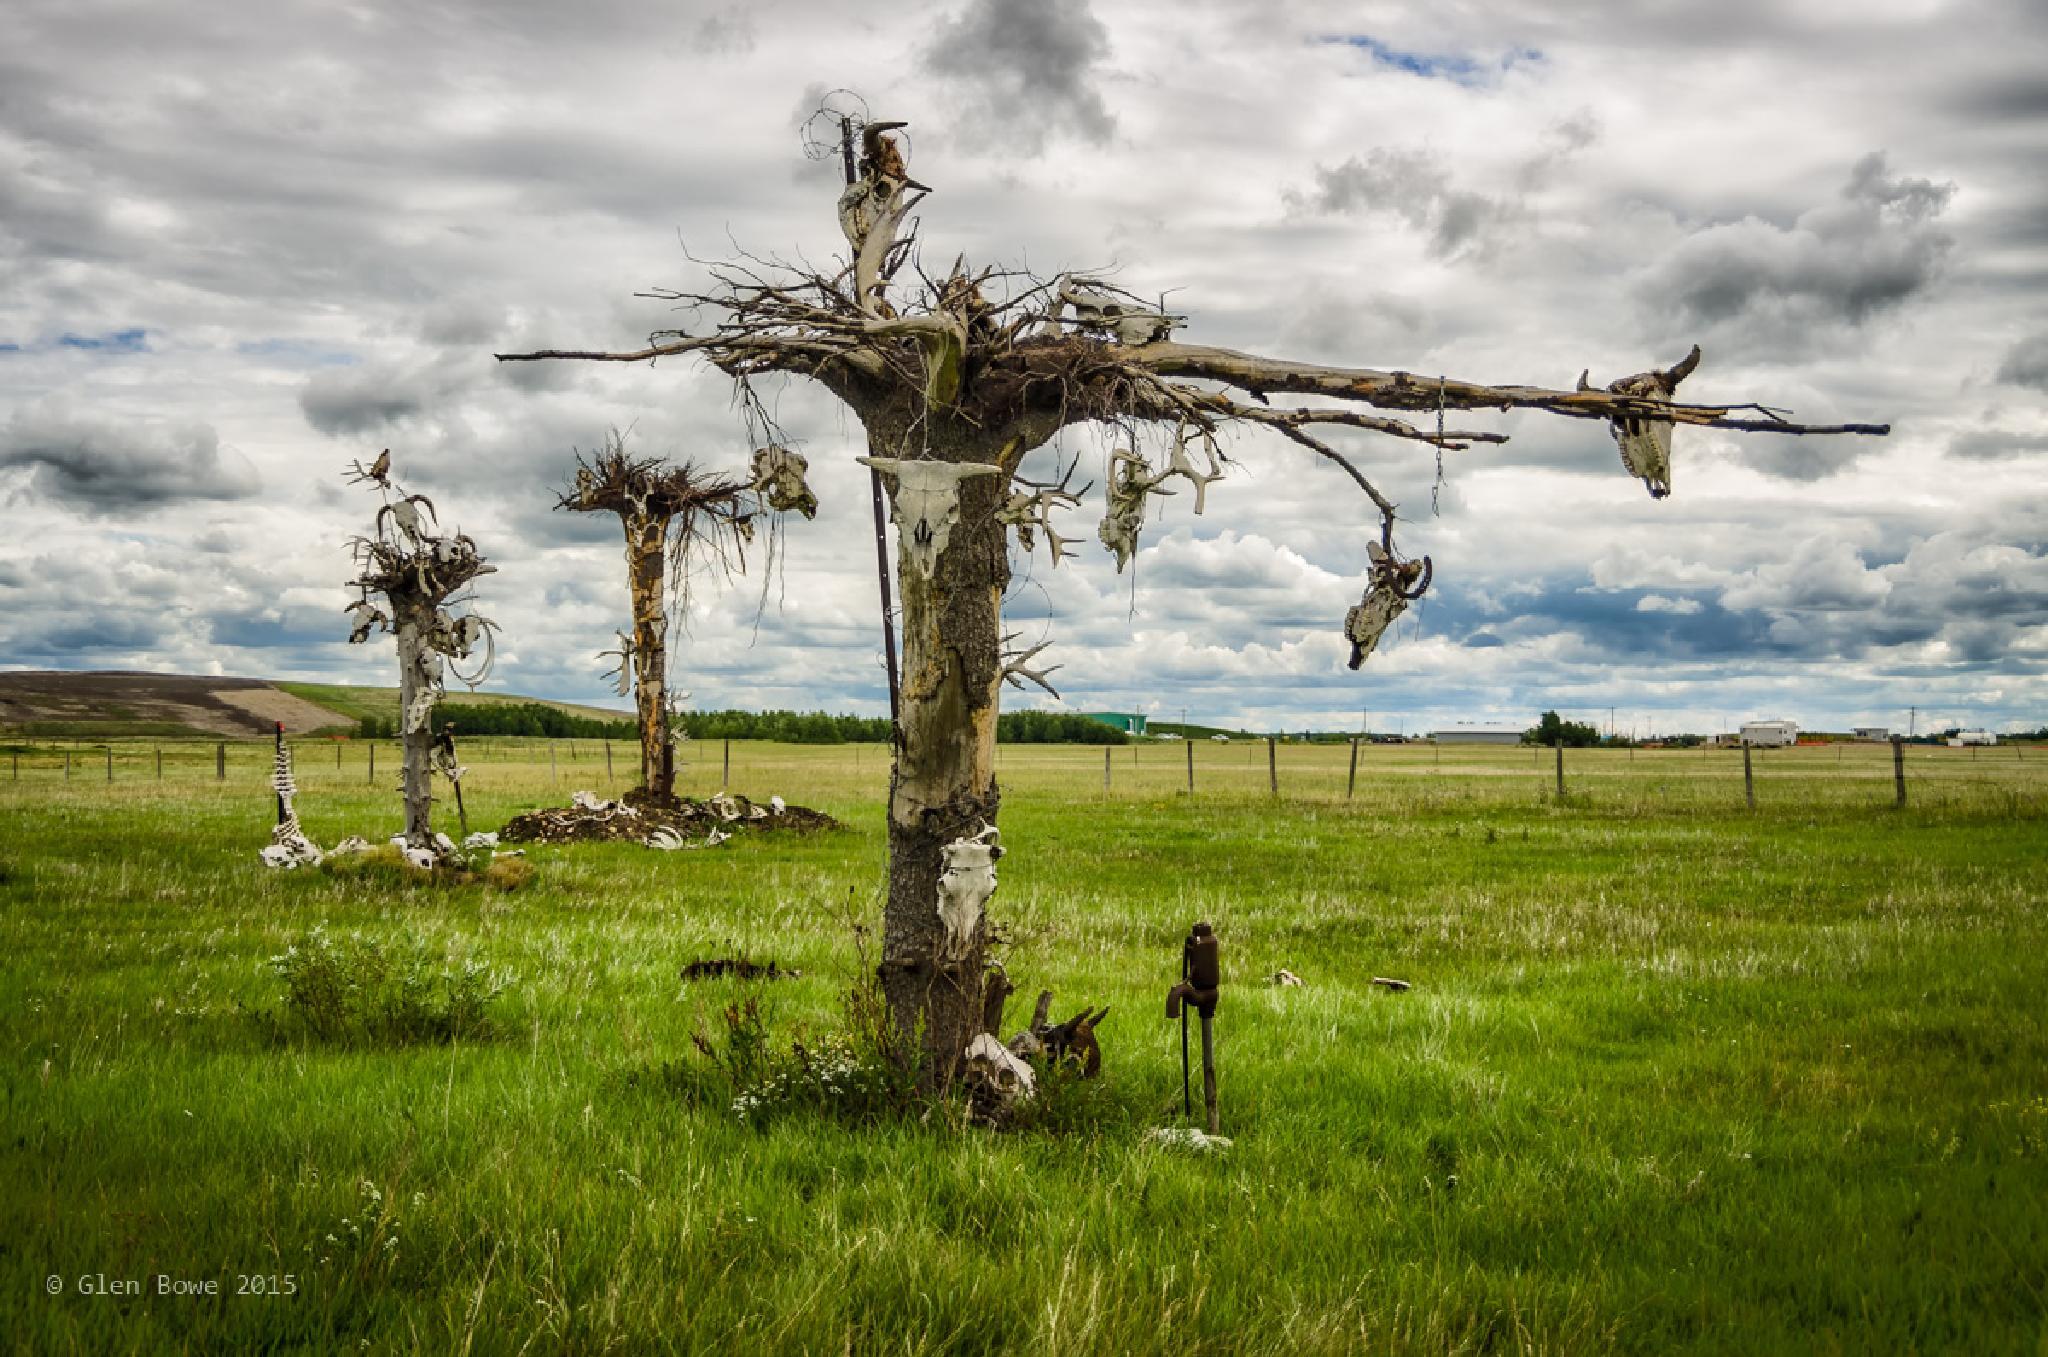 The Weird Tree of Bones by Glen Bowe